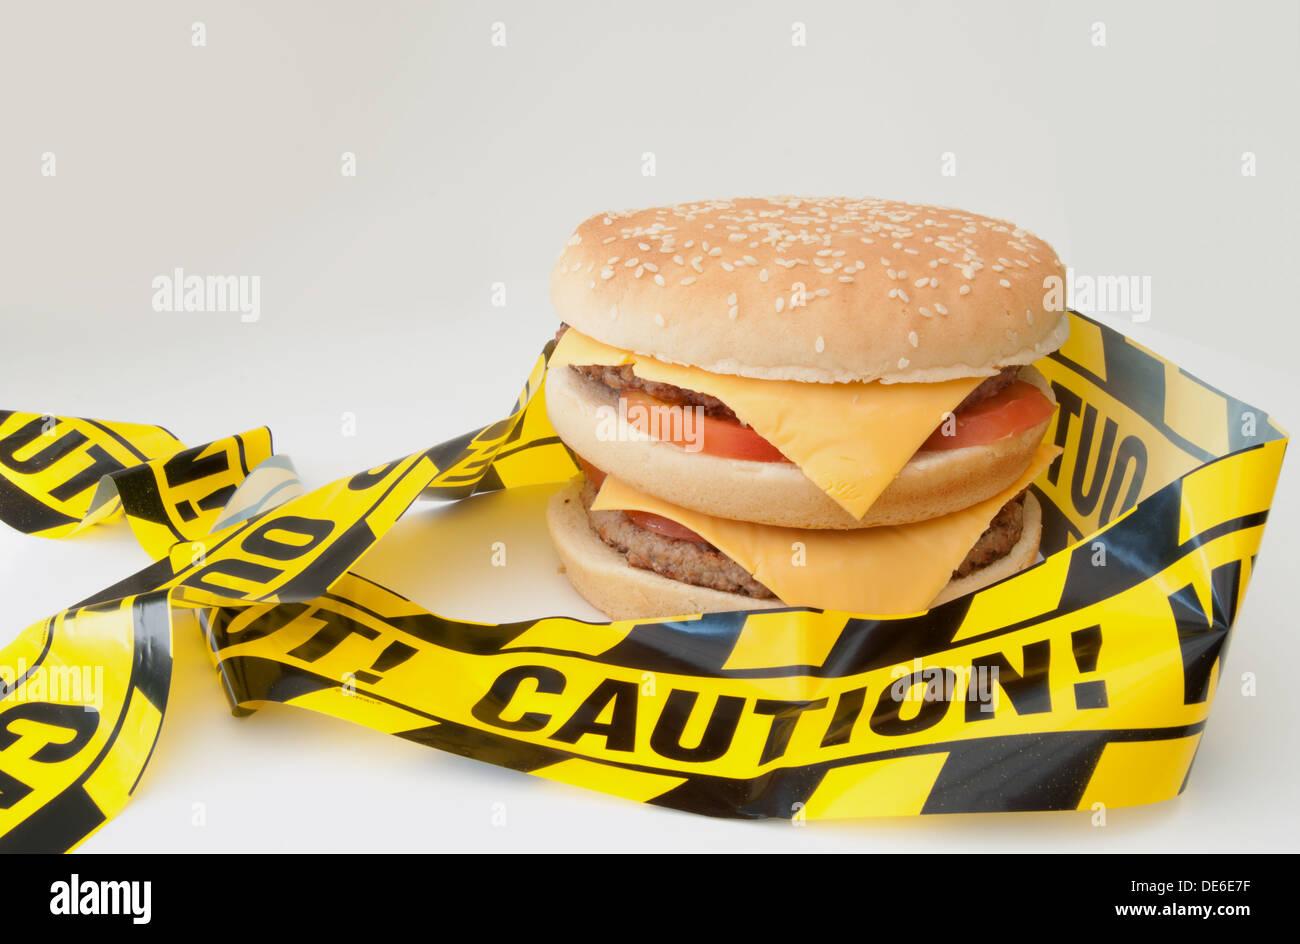 Ungesunde Lebensmittel Warnung Stockbild